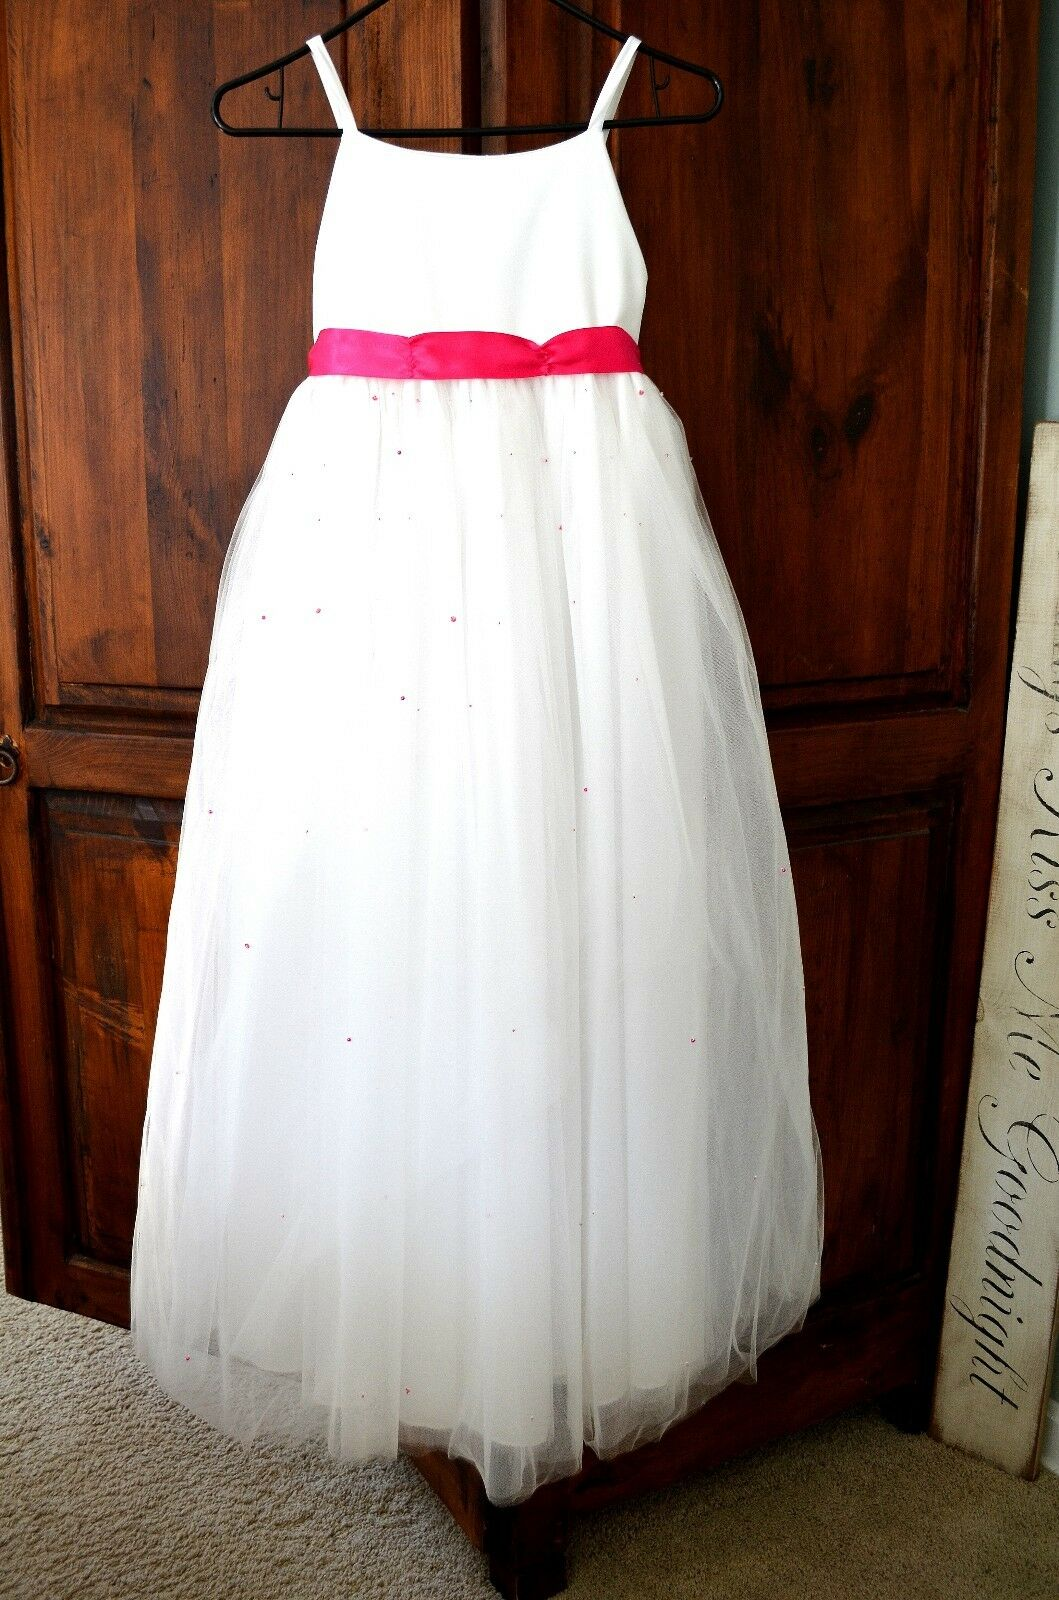 Sweet Beginnings Bridesmaid Flower Girl Tulle DRESS sz 10 white pink fucshia